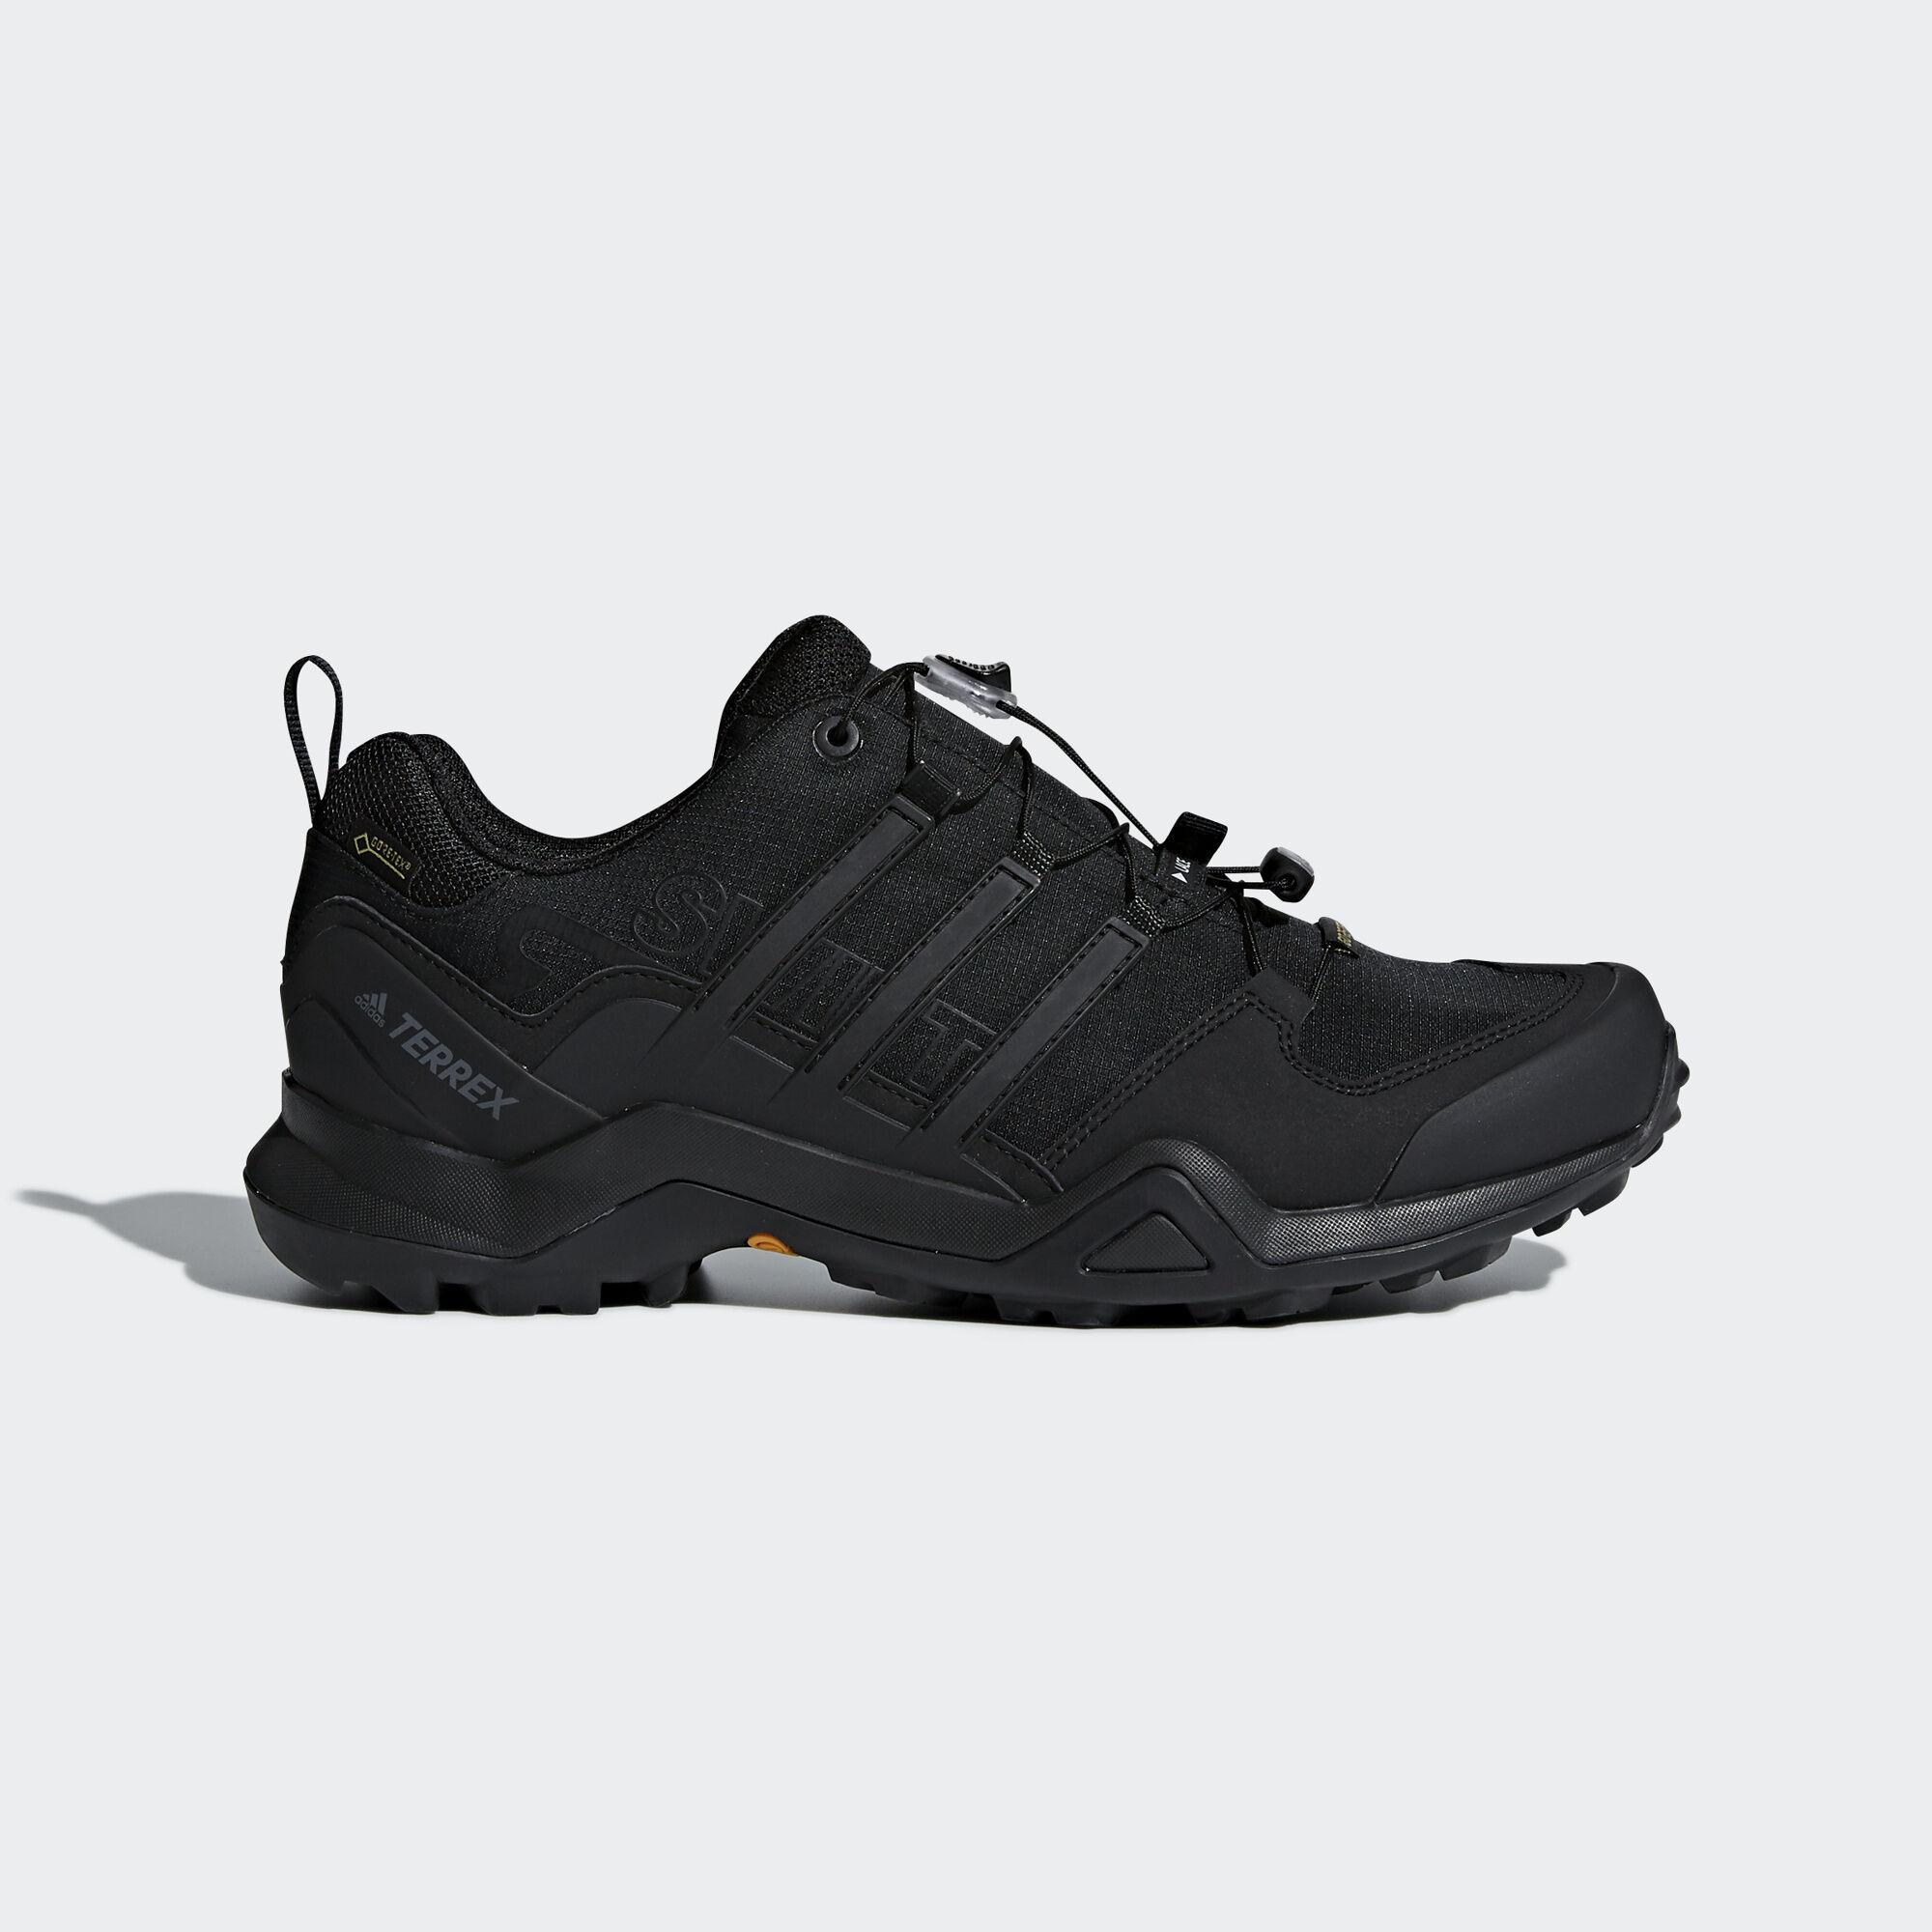 adidas - Terrex Swift R2 GTX Shoes Core Black Core Black Core Black CM7492 67316bf1b7